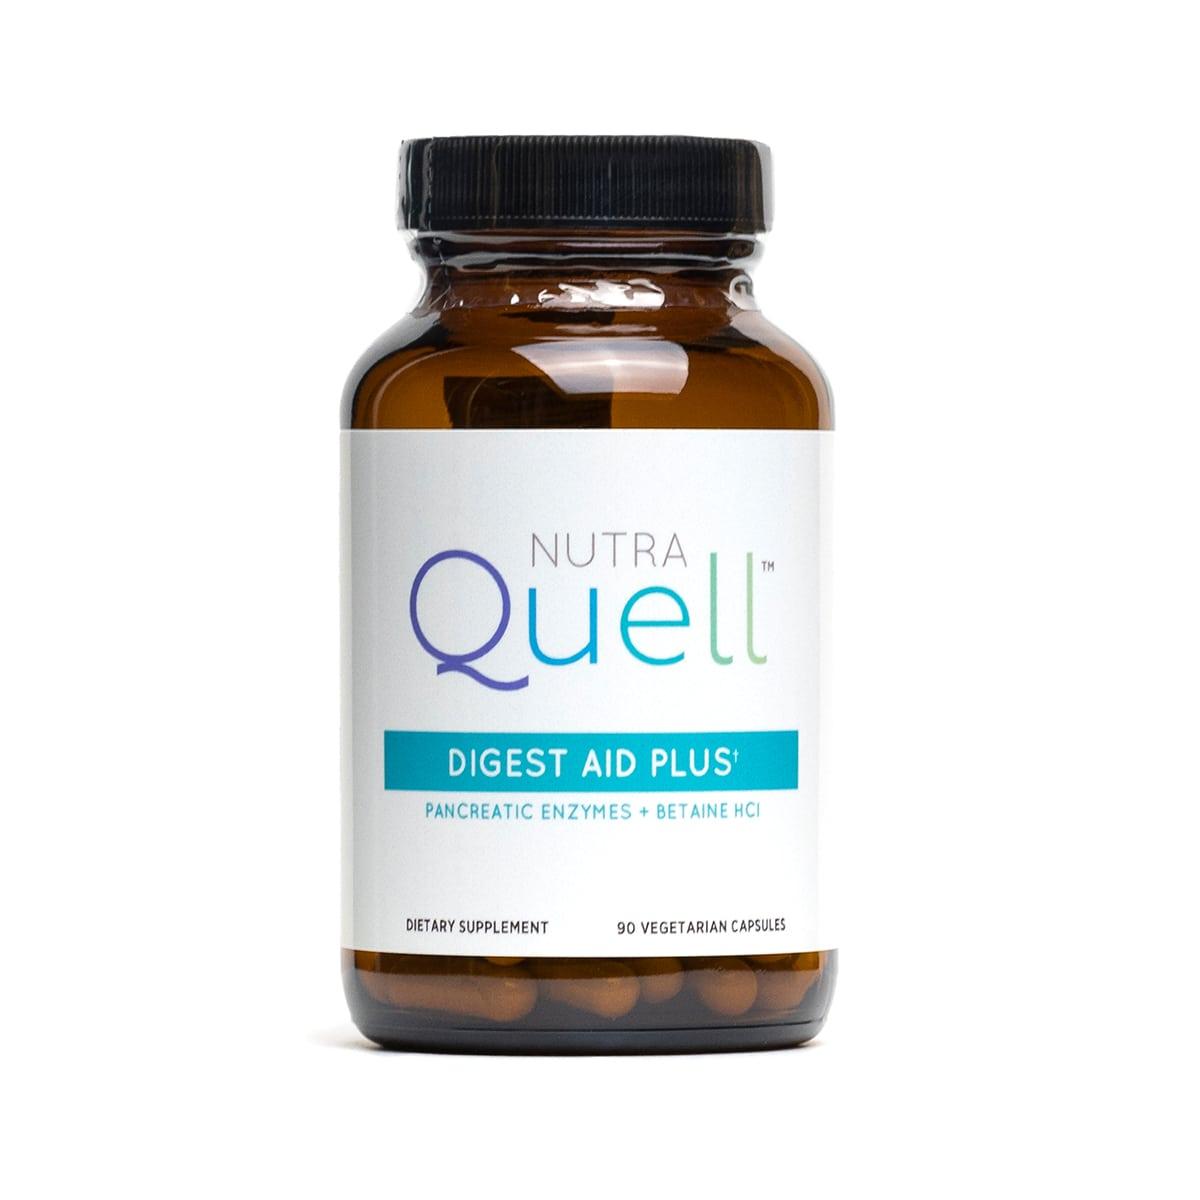 Digest Aid Plus